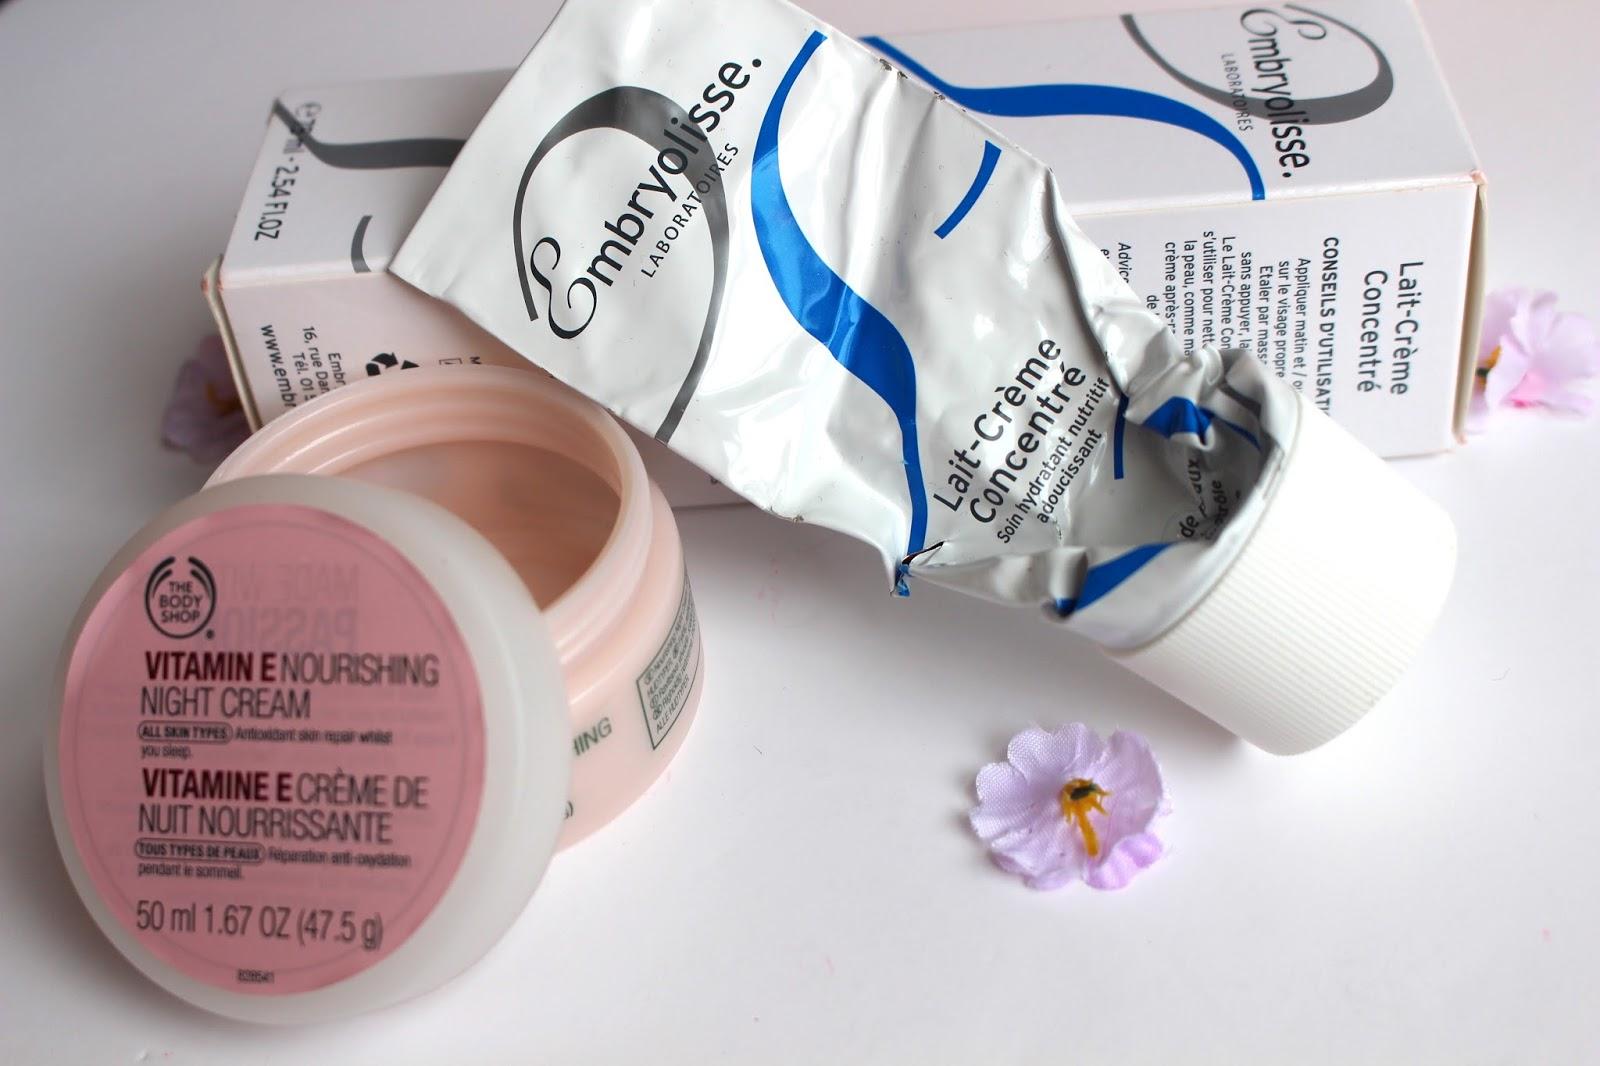 bodyshop embryolisse creams good for skin empties